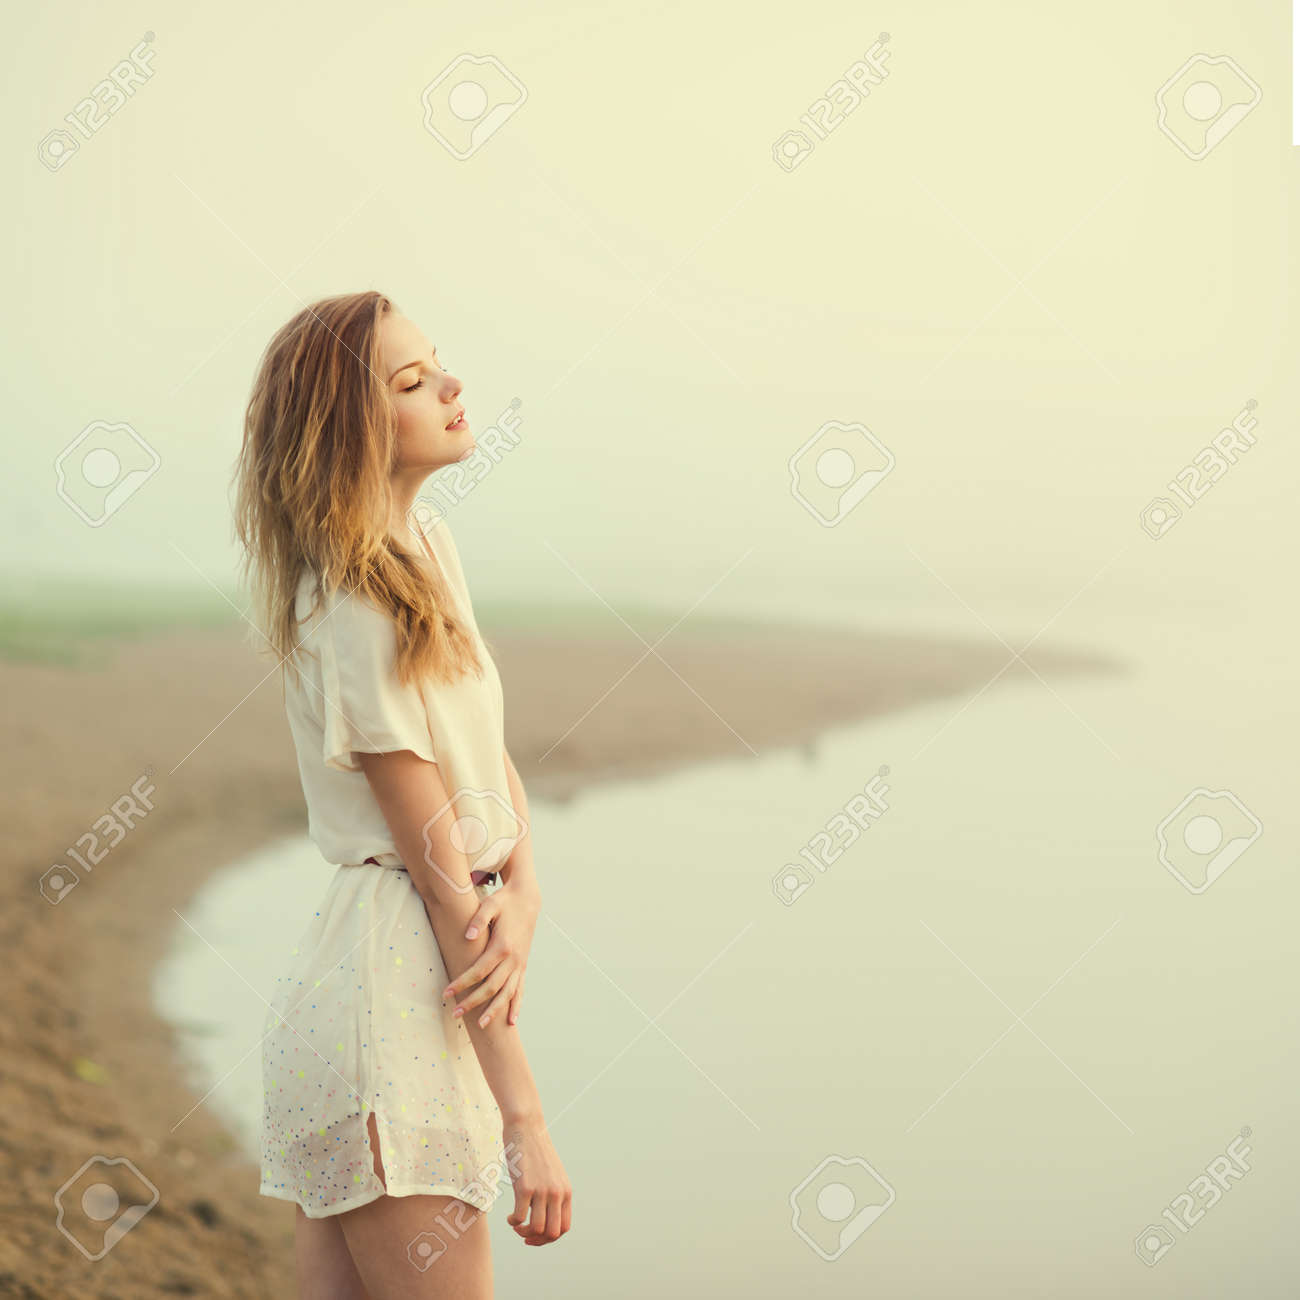 Beautiful sad girl in the morning on the beach stock photo 25985737